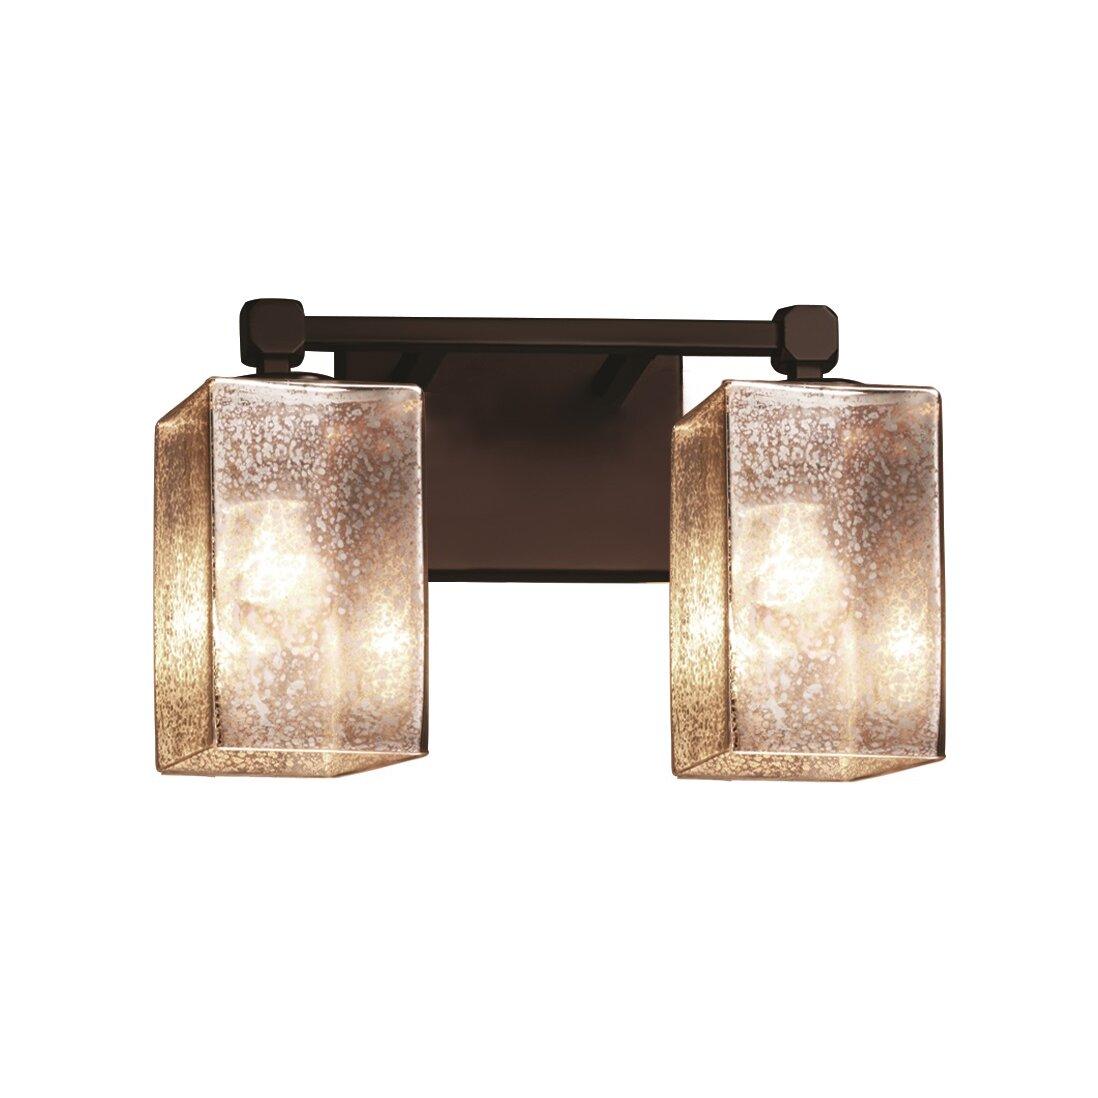 Justice design group fusion tetra 2 light vanity light reviews wayfair - Justice design group bathroom lighting ...